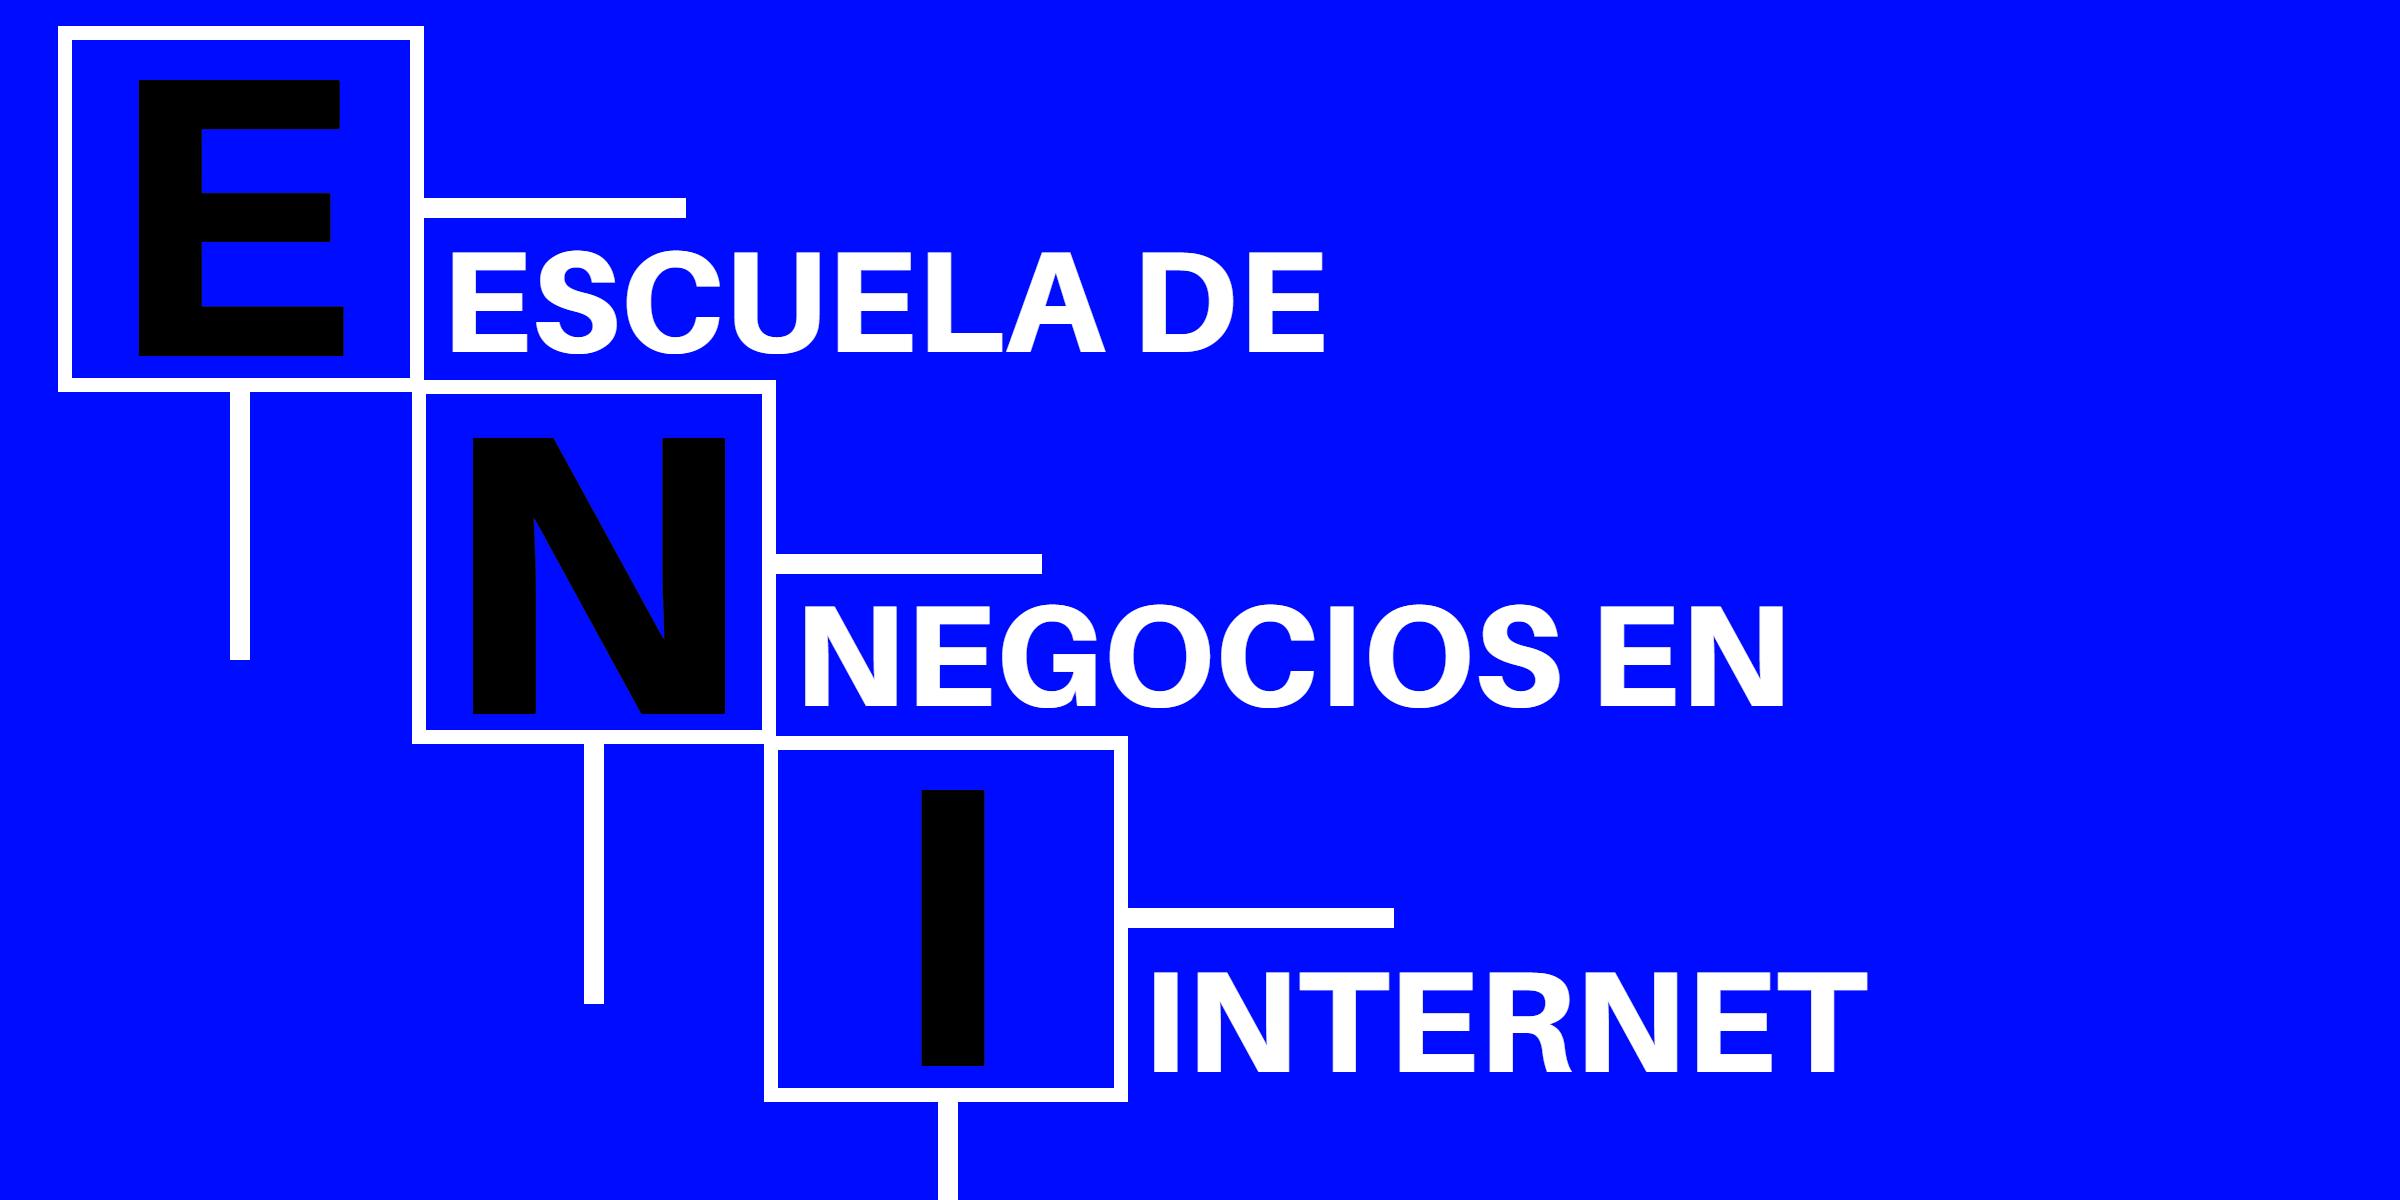 Escuela De Negocios En Internet - Logo